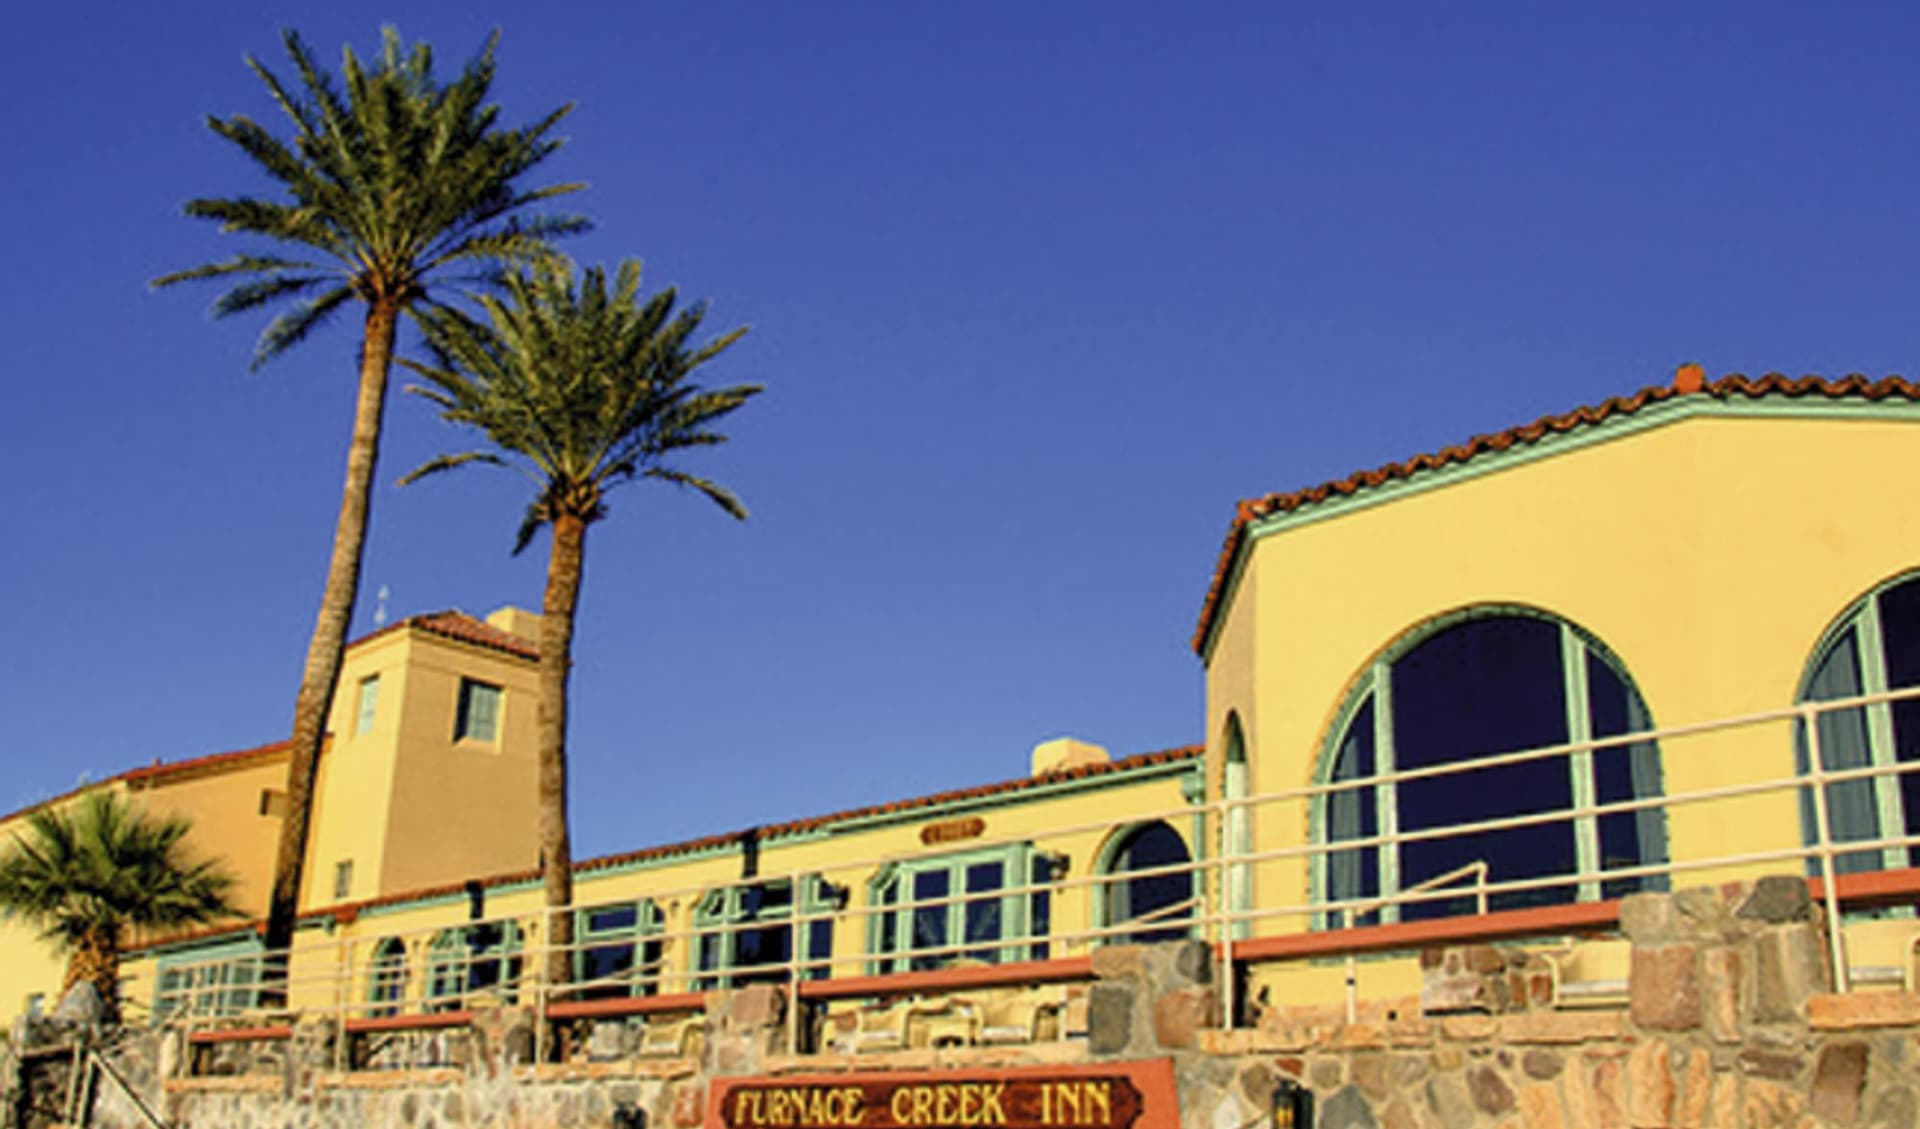 The Inn at Death Valley: exterior furnace creek inn gelbes hotel palme